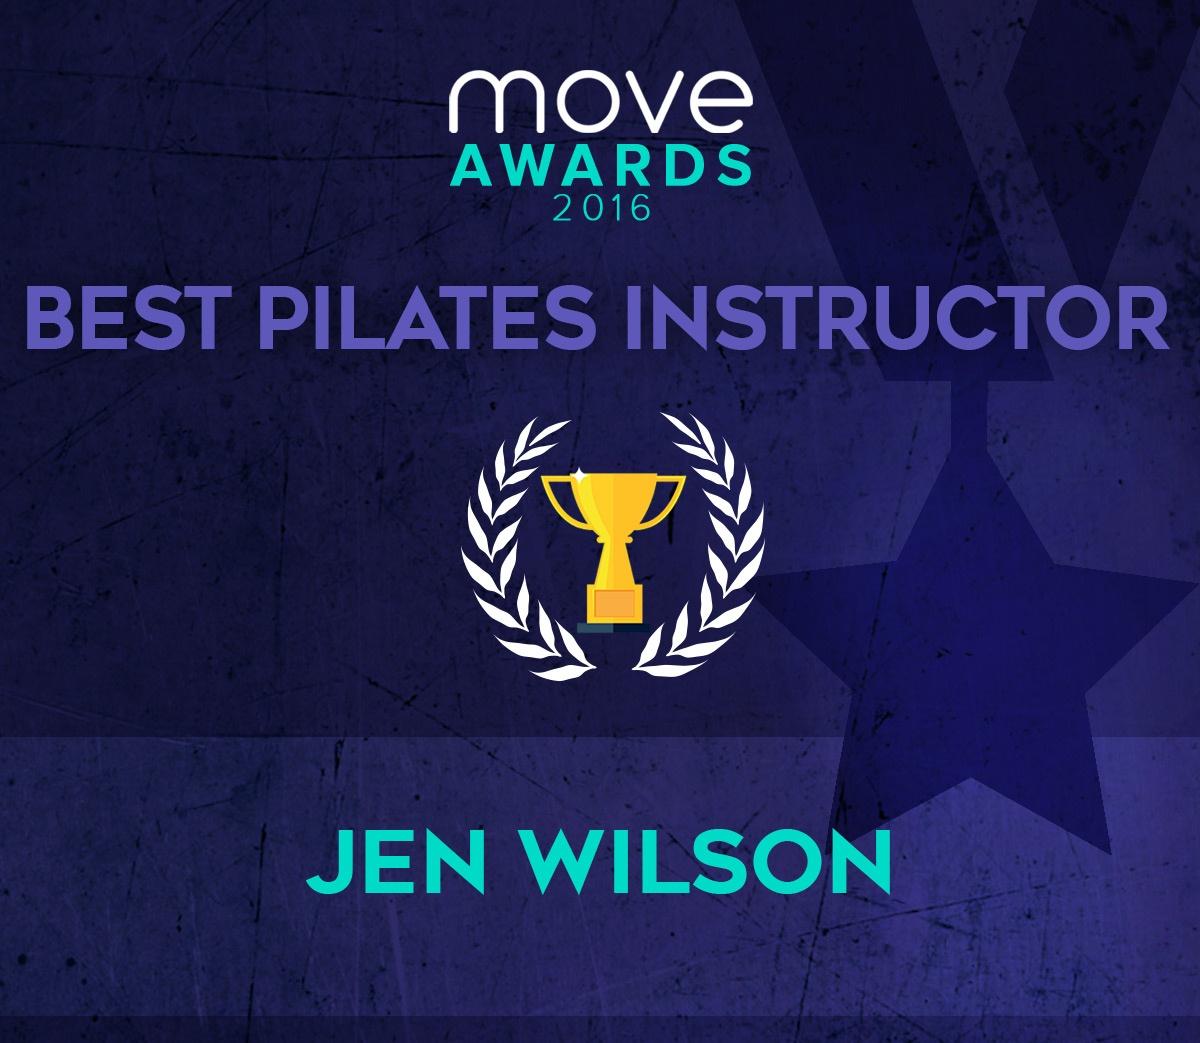 Best-Pilates-Instructor-Glasgow.jpg